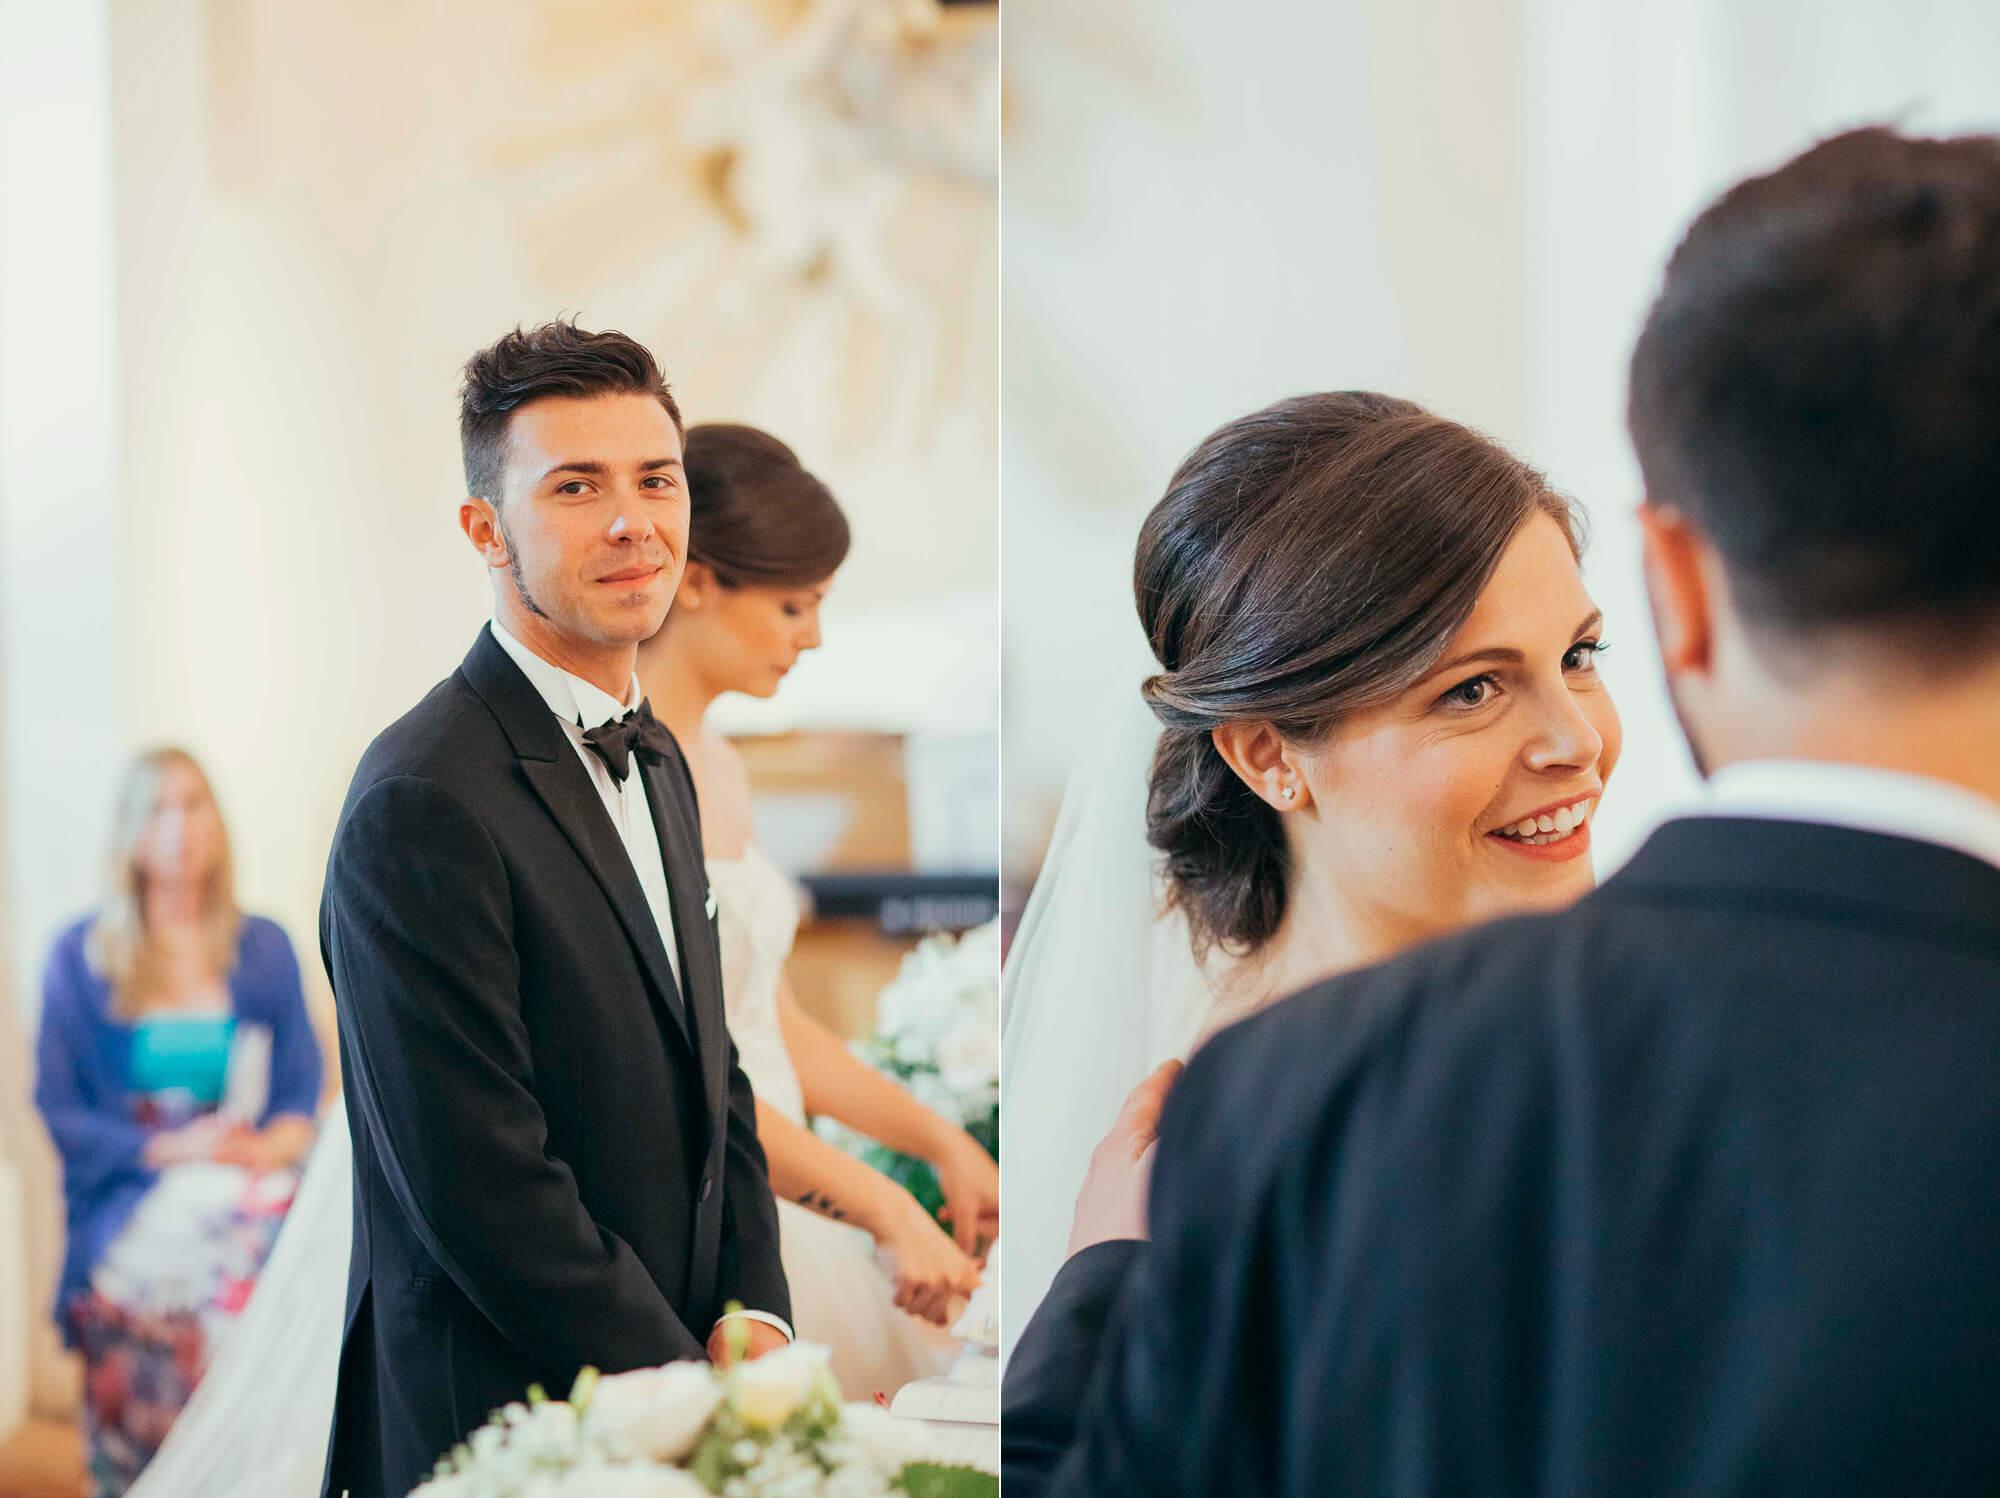 065-arezzo-wedding-photographer.jpg